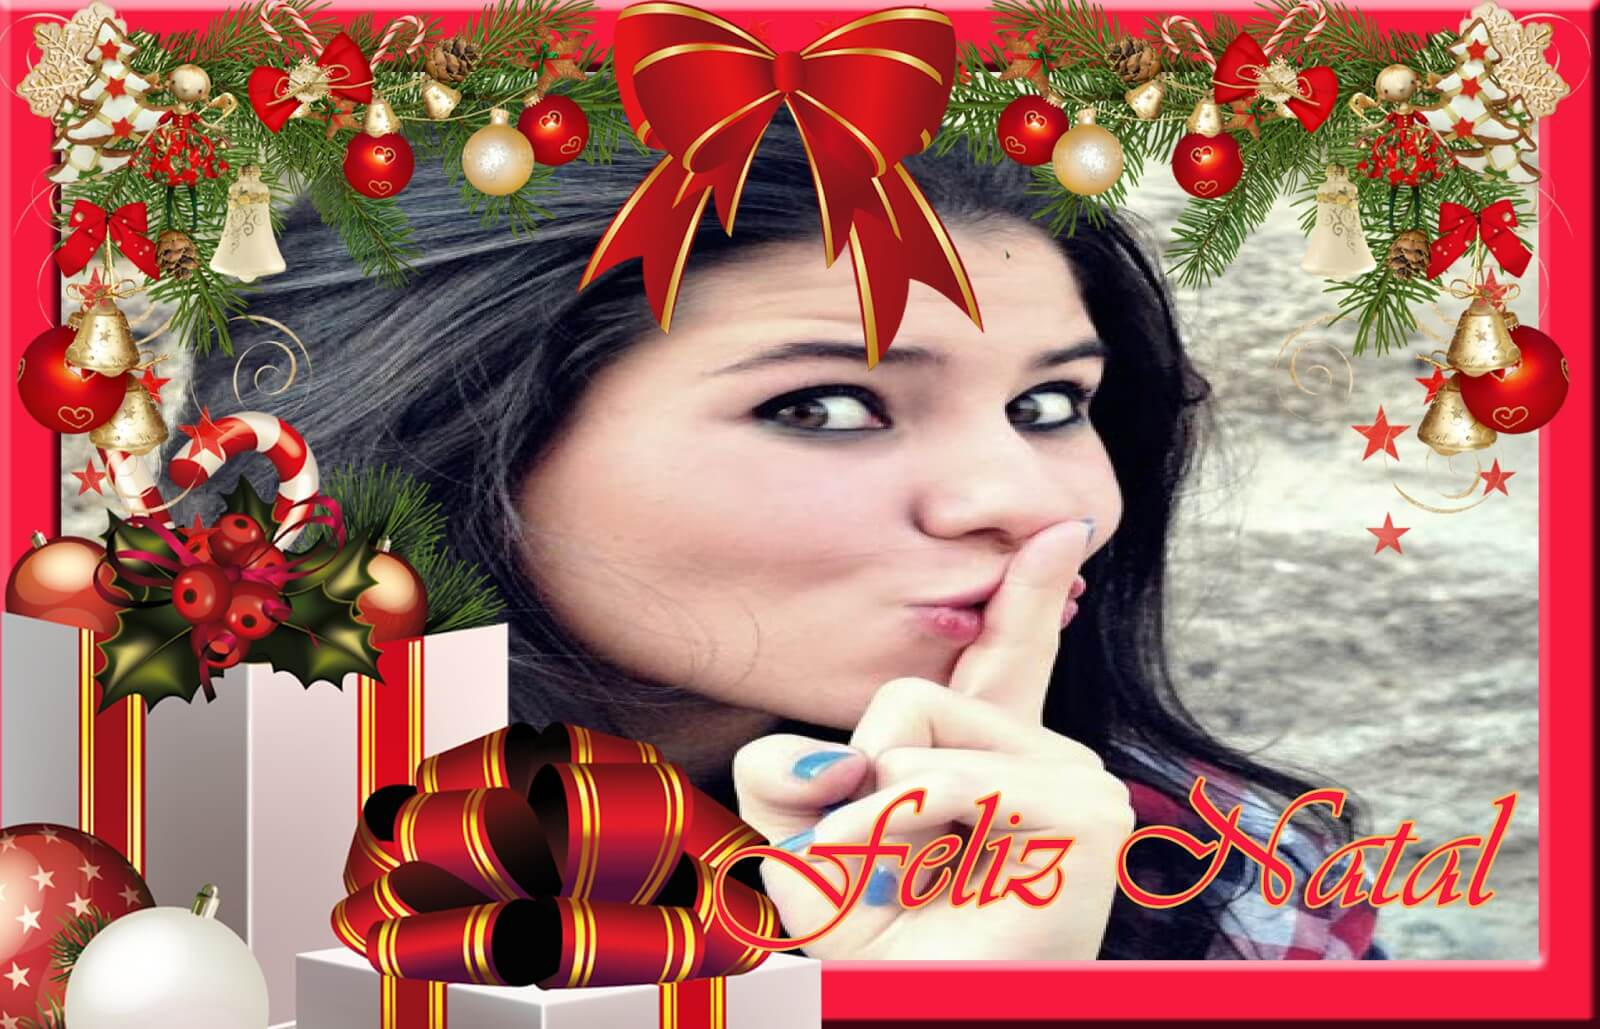 montagem-de-fotos-feliz-natal